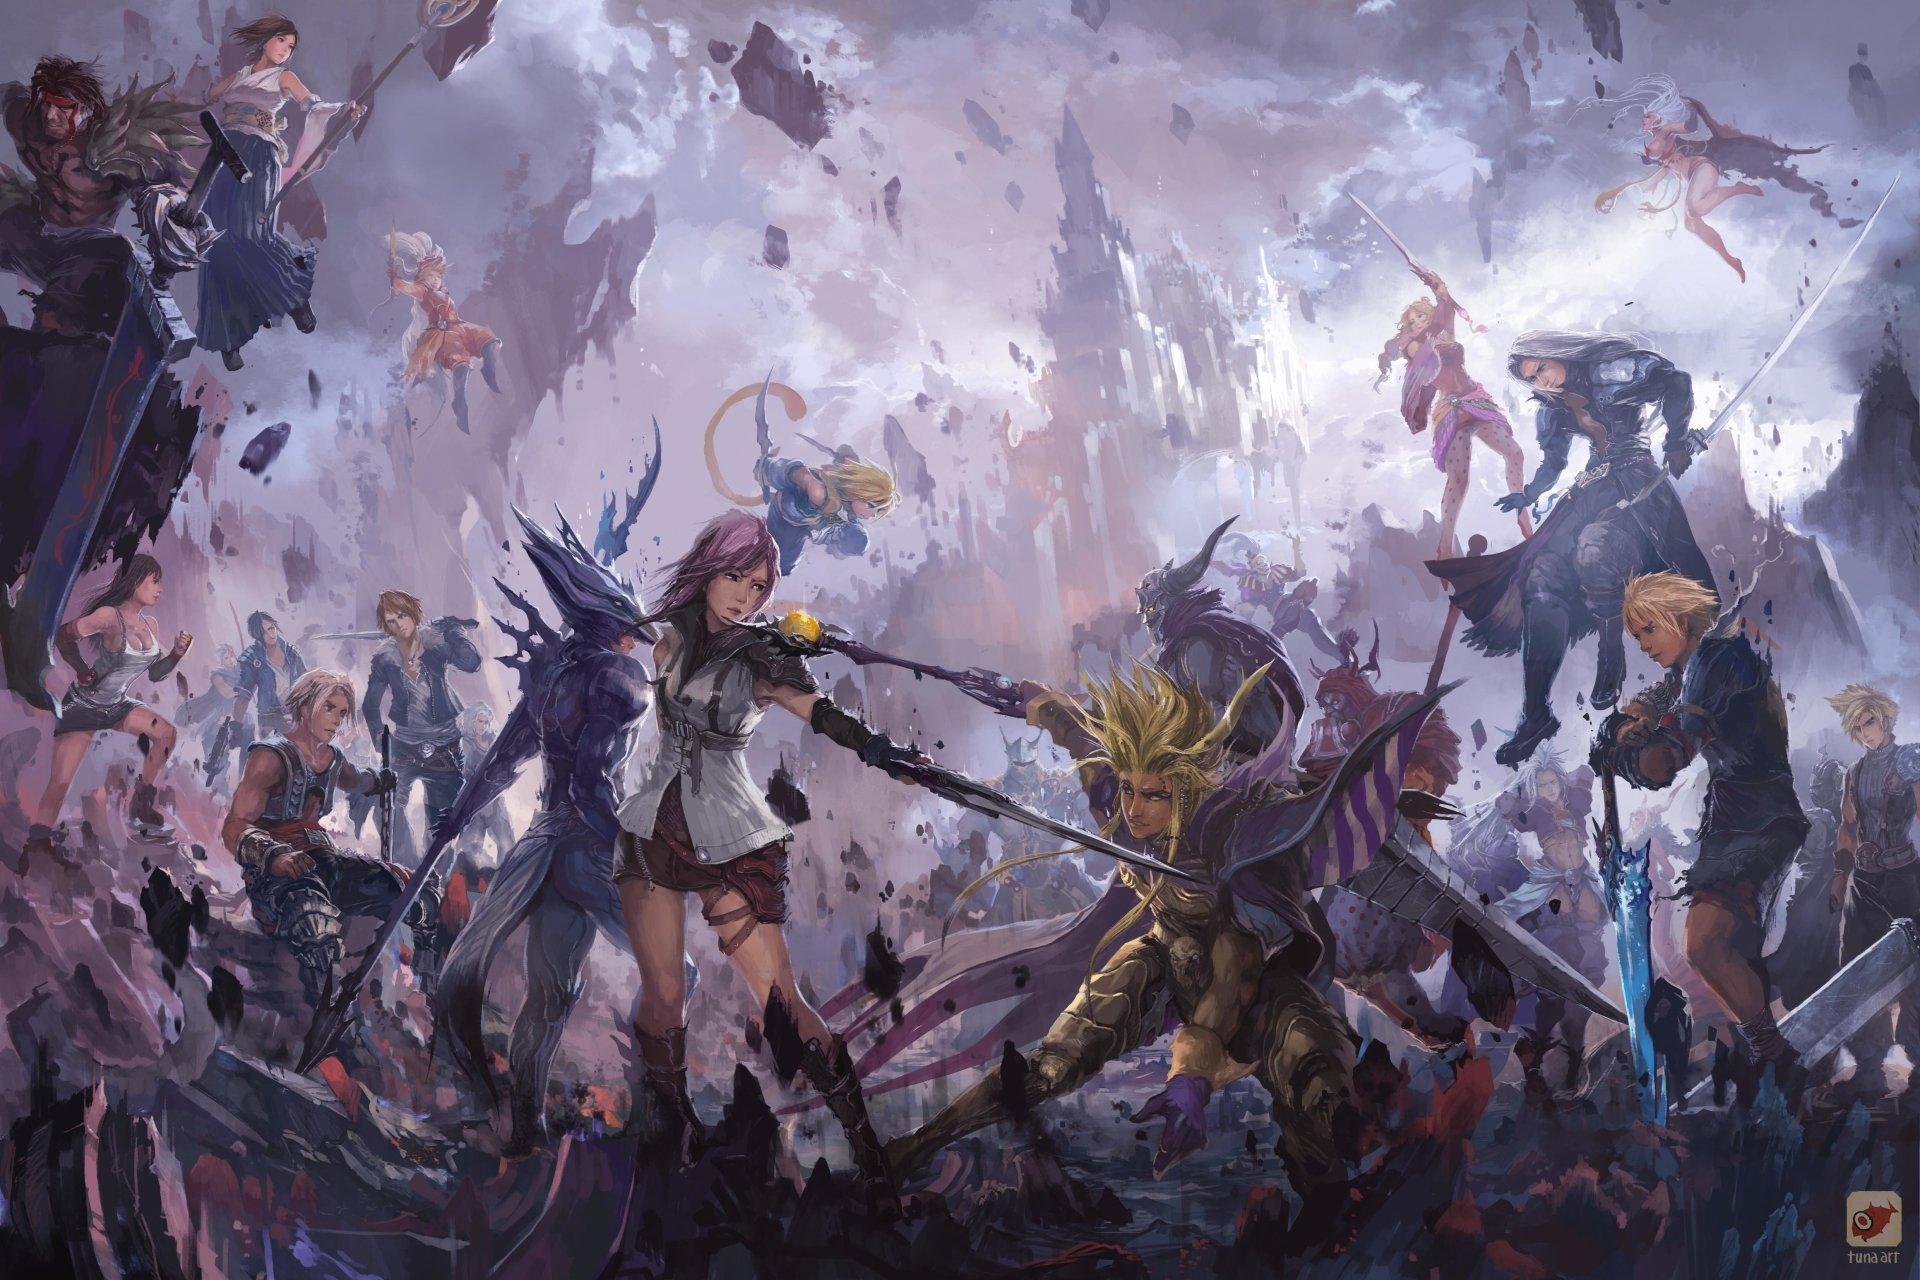 Dissidia 012 Final Fantasy 4k Ultra HD Wallpaper And